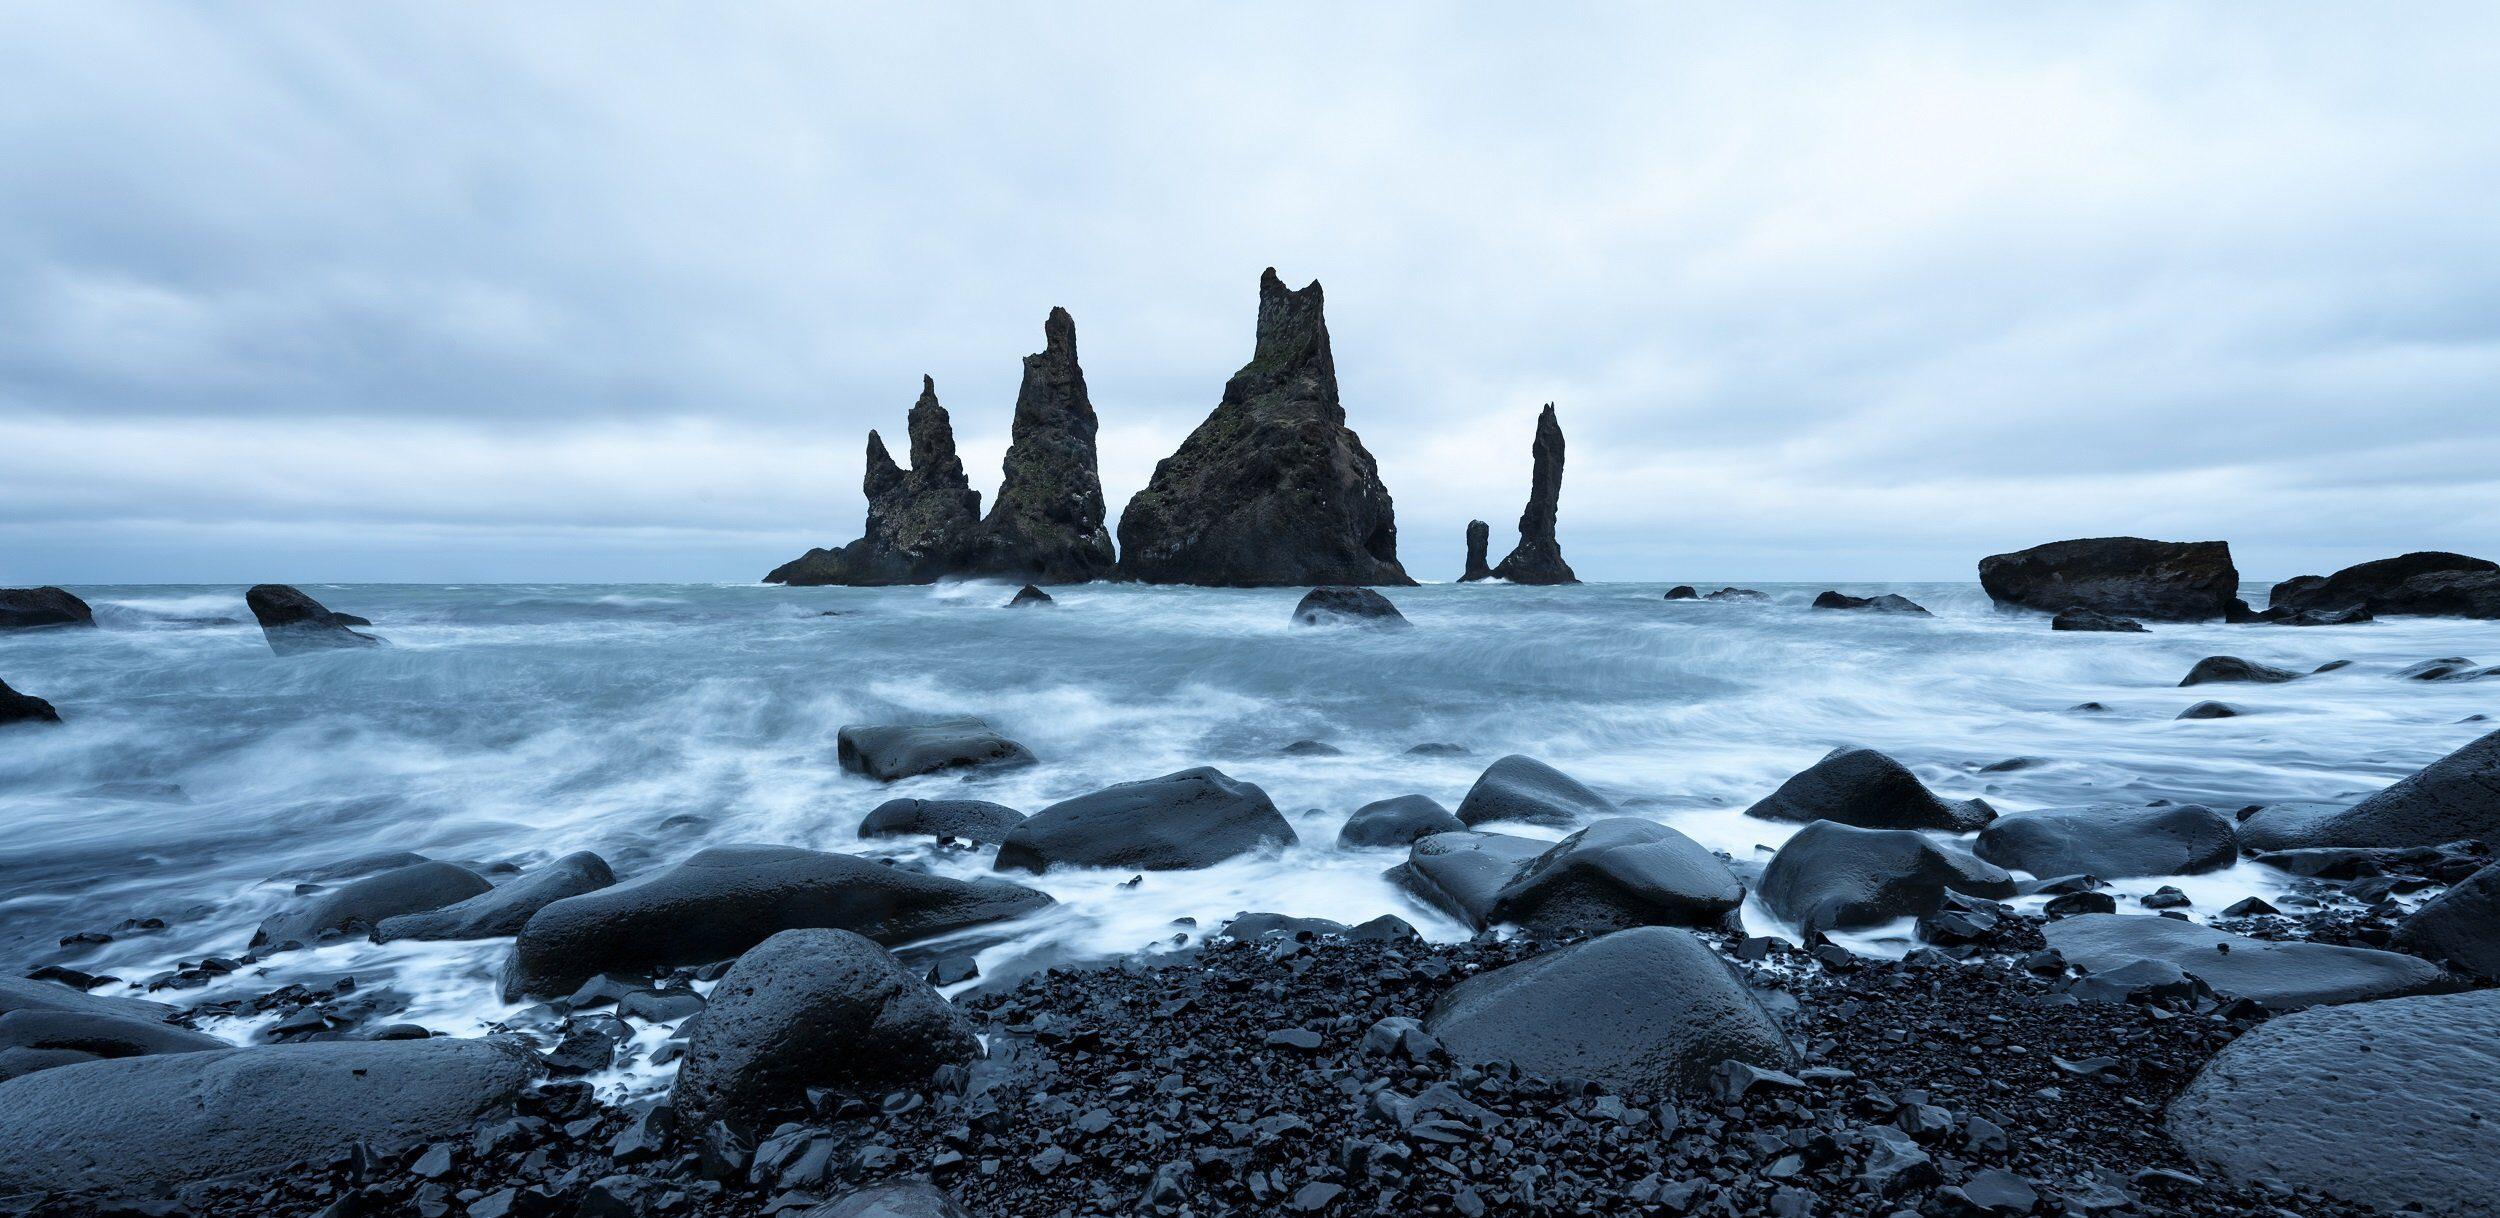 Reynisdrangar,seastacks_5 Day Golden Circle, Jökulsárlón & Blue Lagoon Tour Package